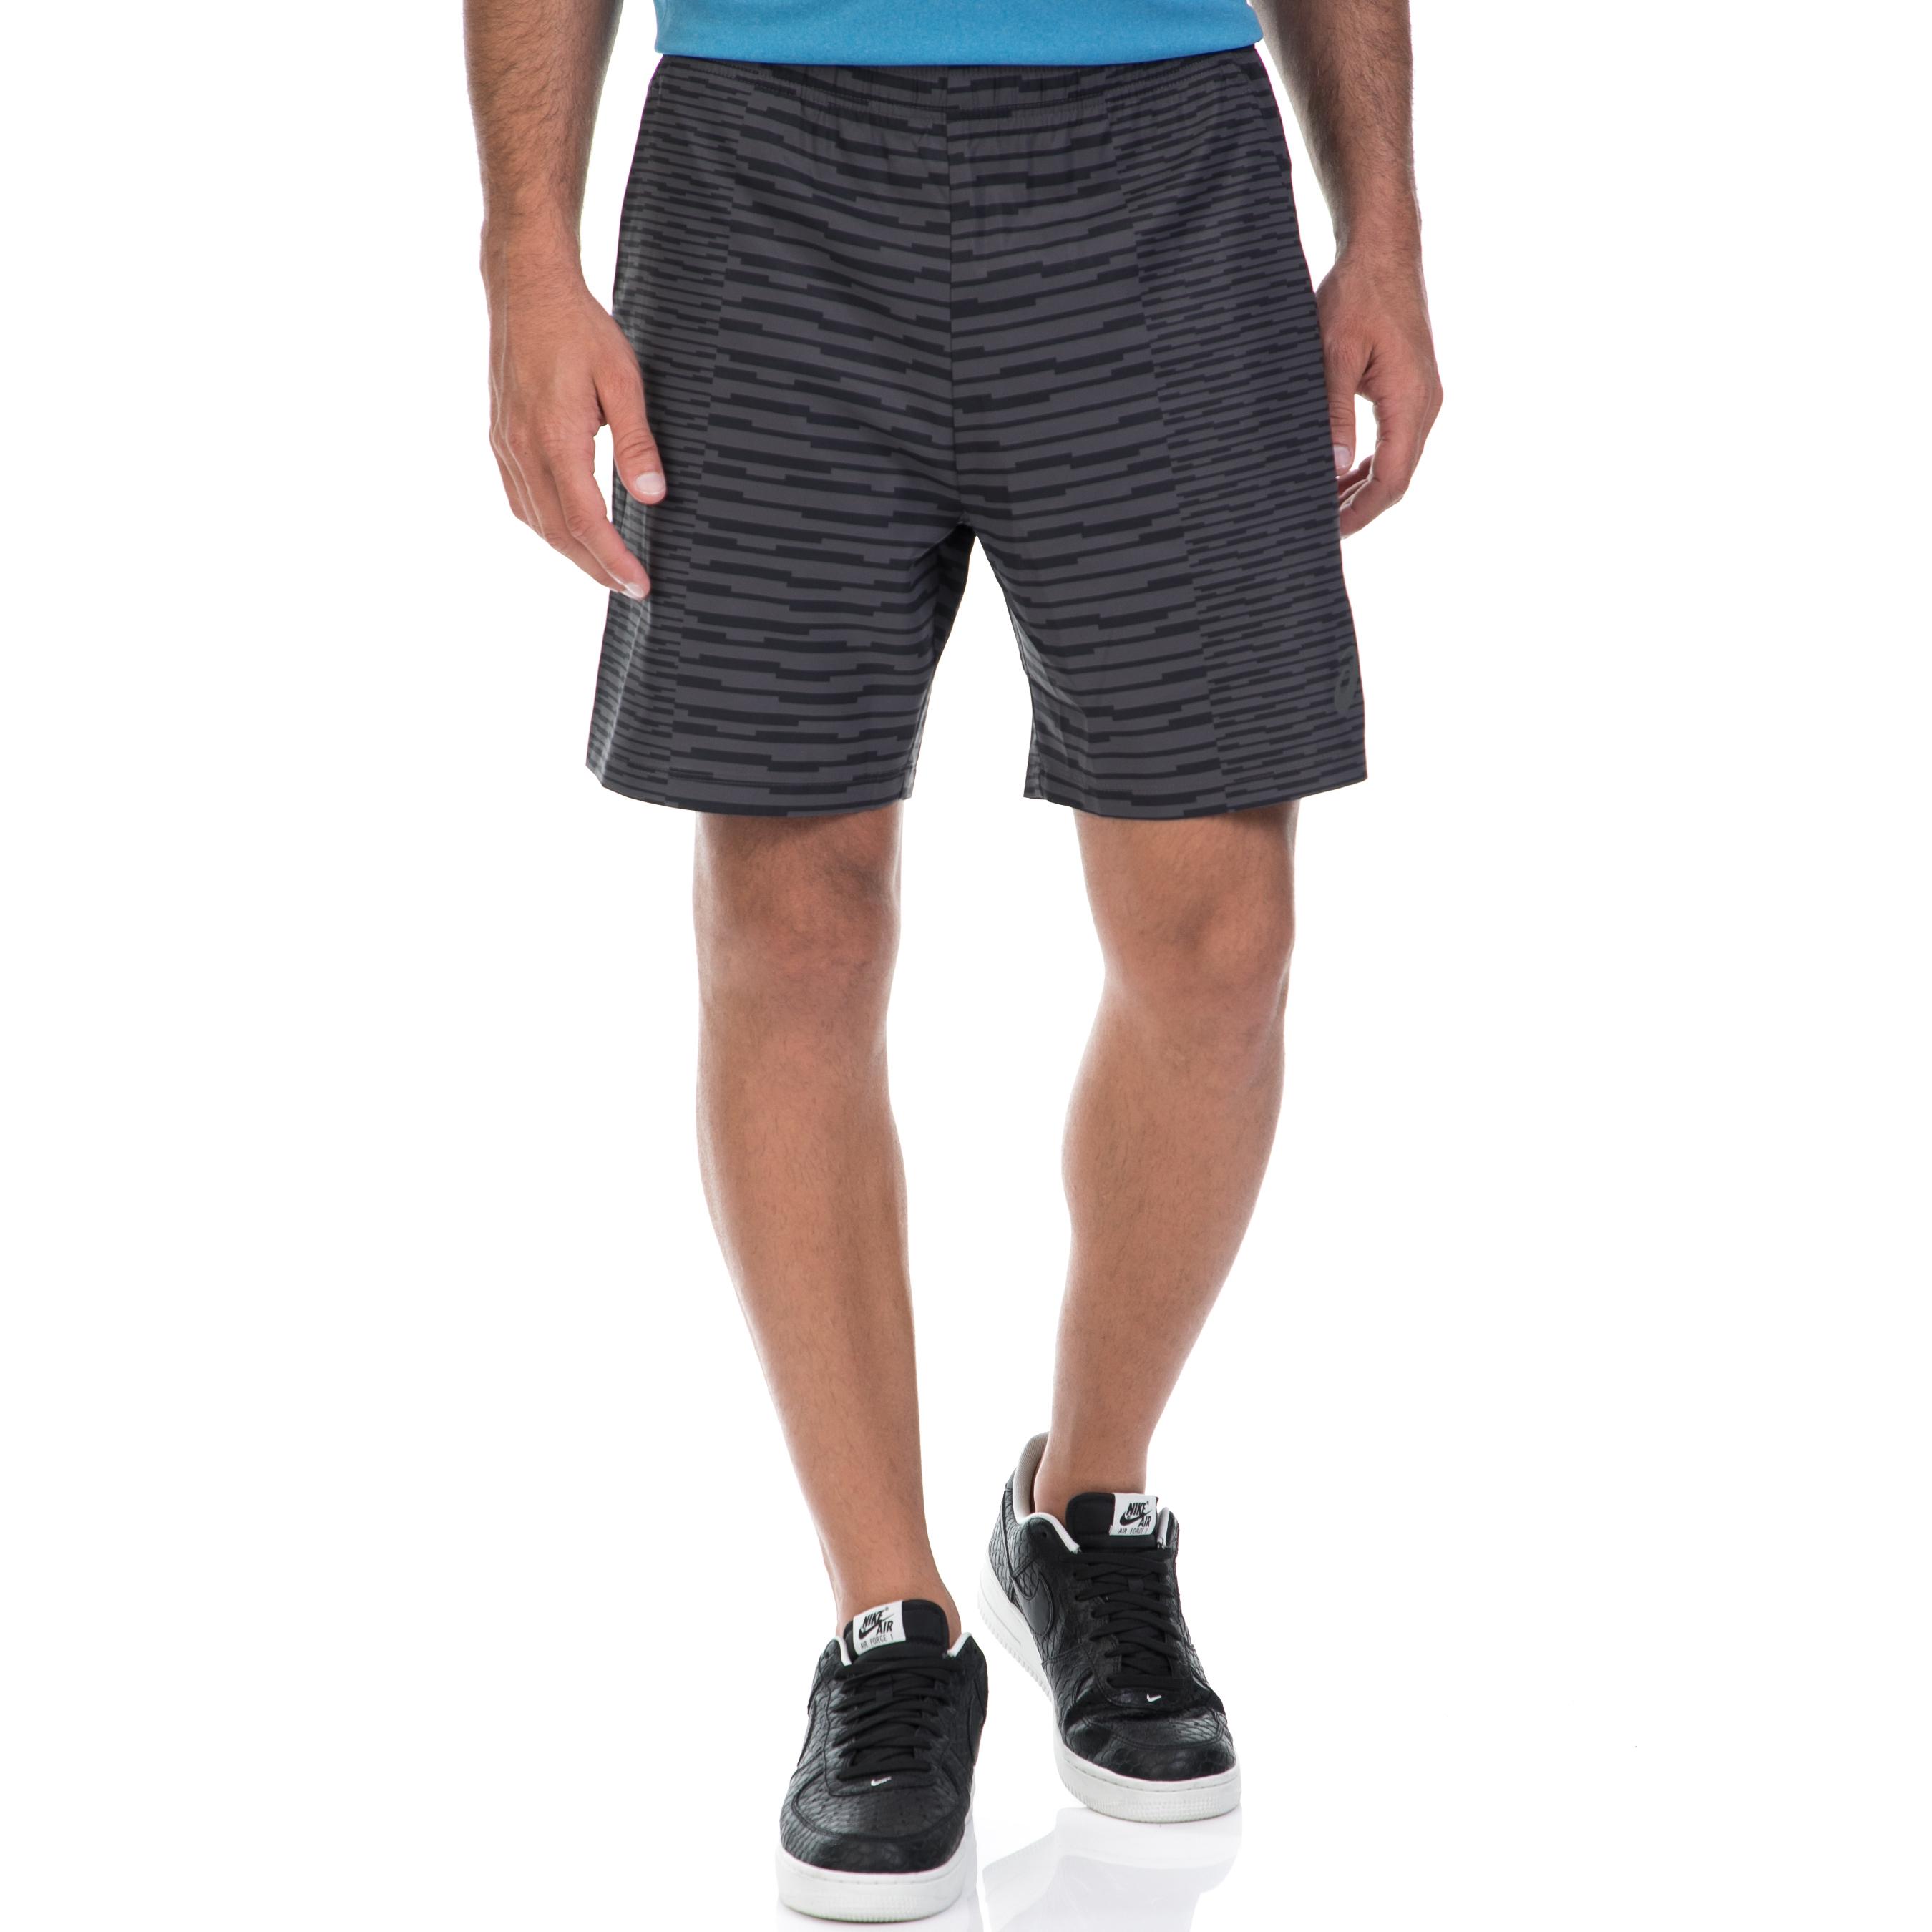 ASICS - ΑΘΛΗΤΙΚΟ ΣΟΡΤΣ ASICS USEX PRINTED ανδρικά ρούχα σορτς βερμούδες αθλητικά